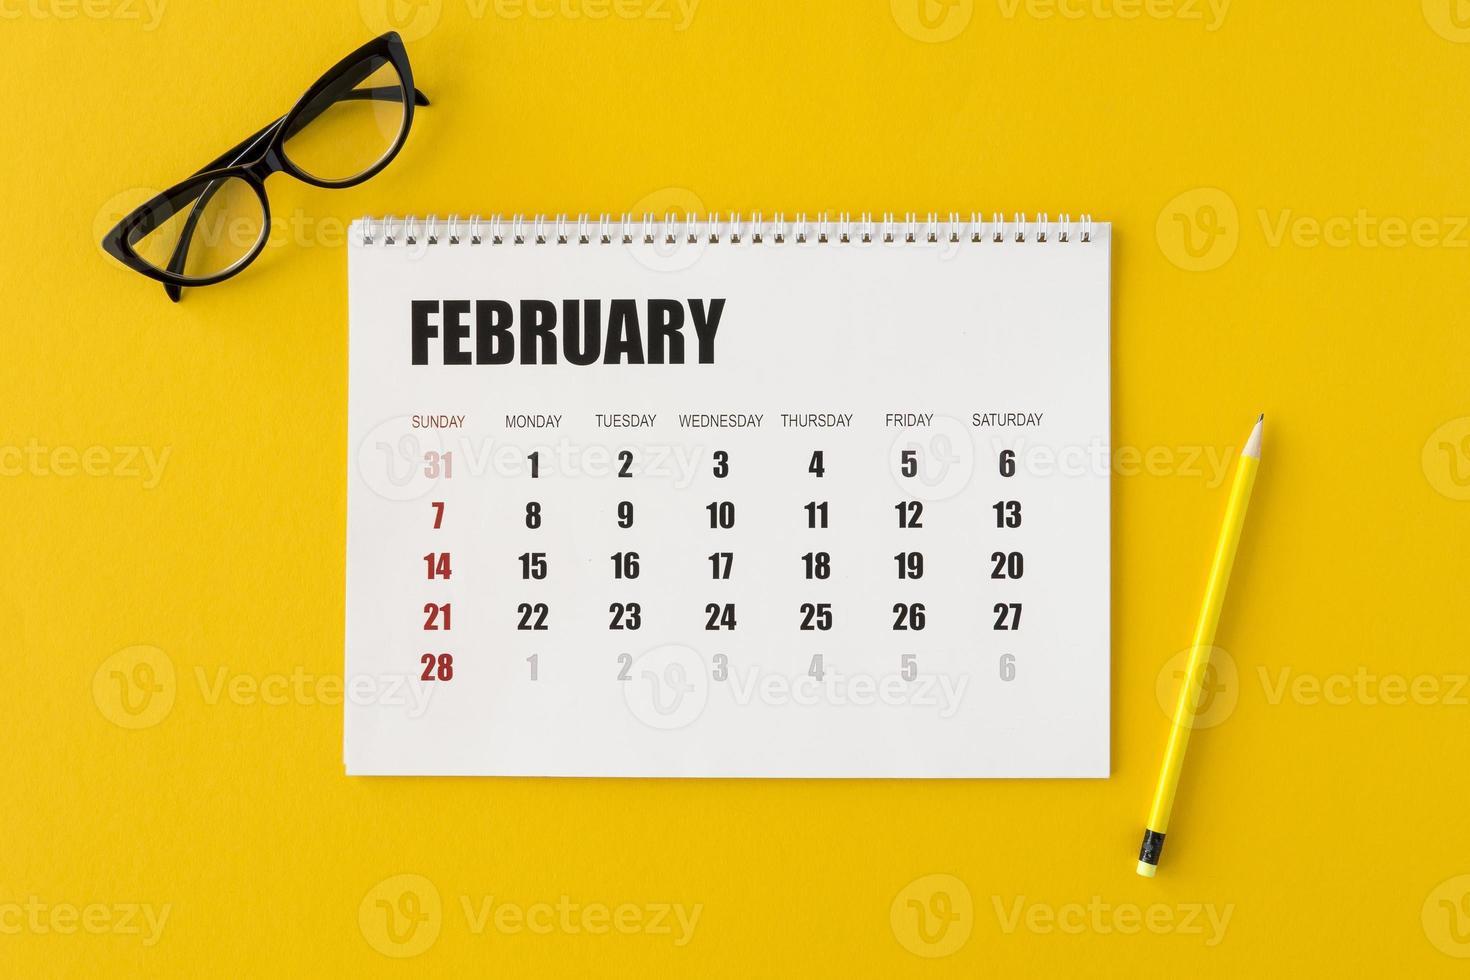 Calendario planificador plano laico sobre fondo amarillo foto